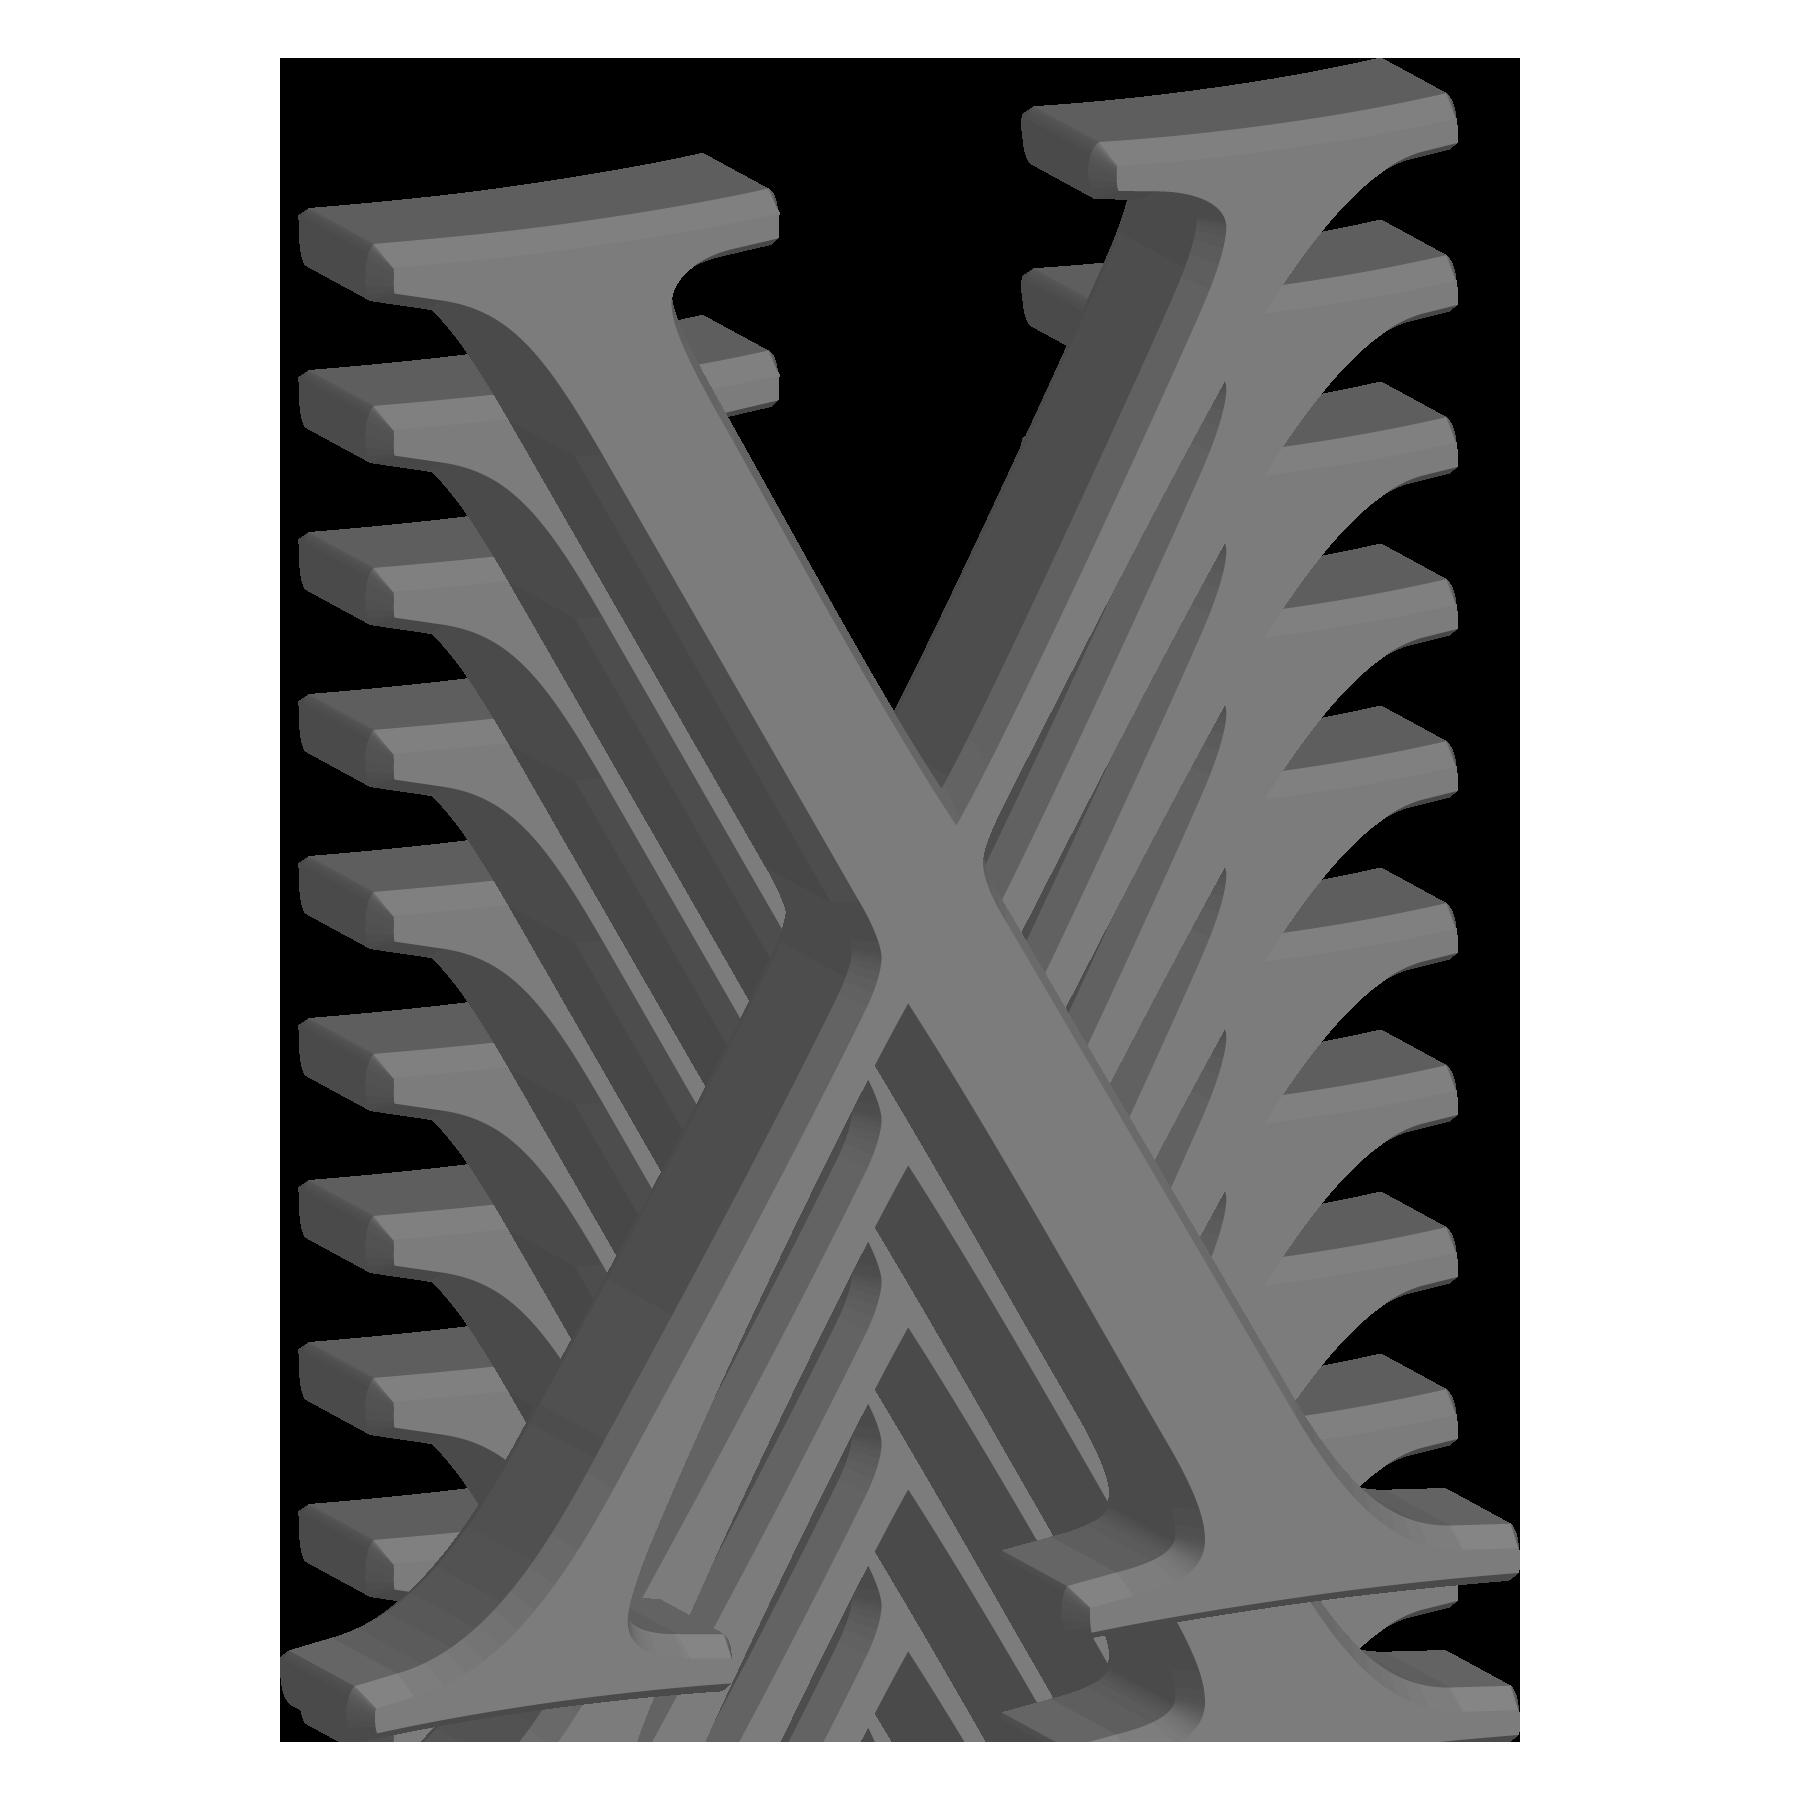 XSXSW 5 Official Lineup Announcement